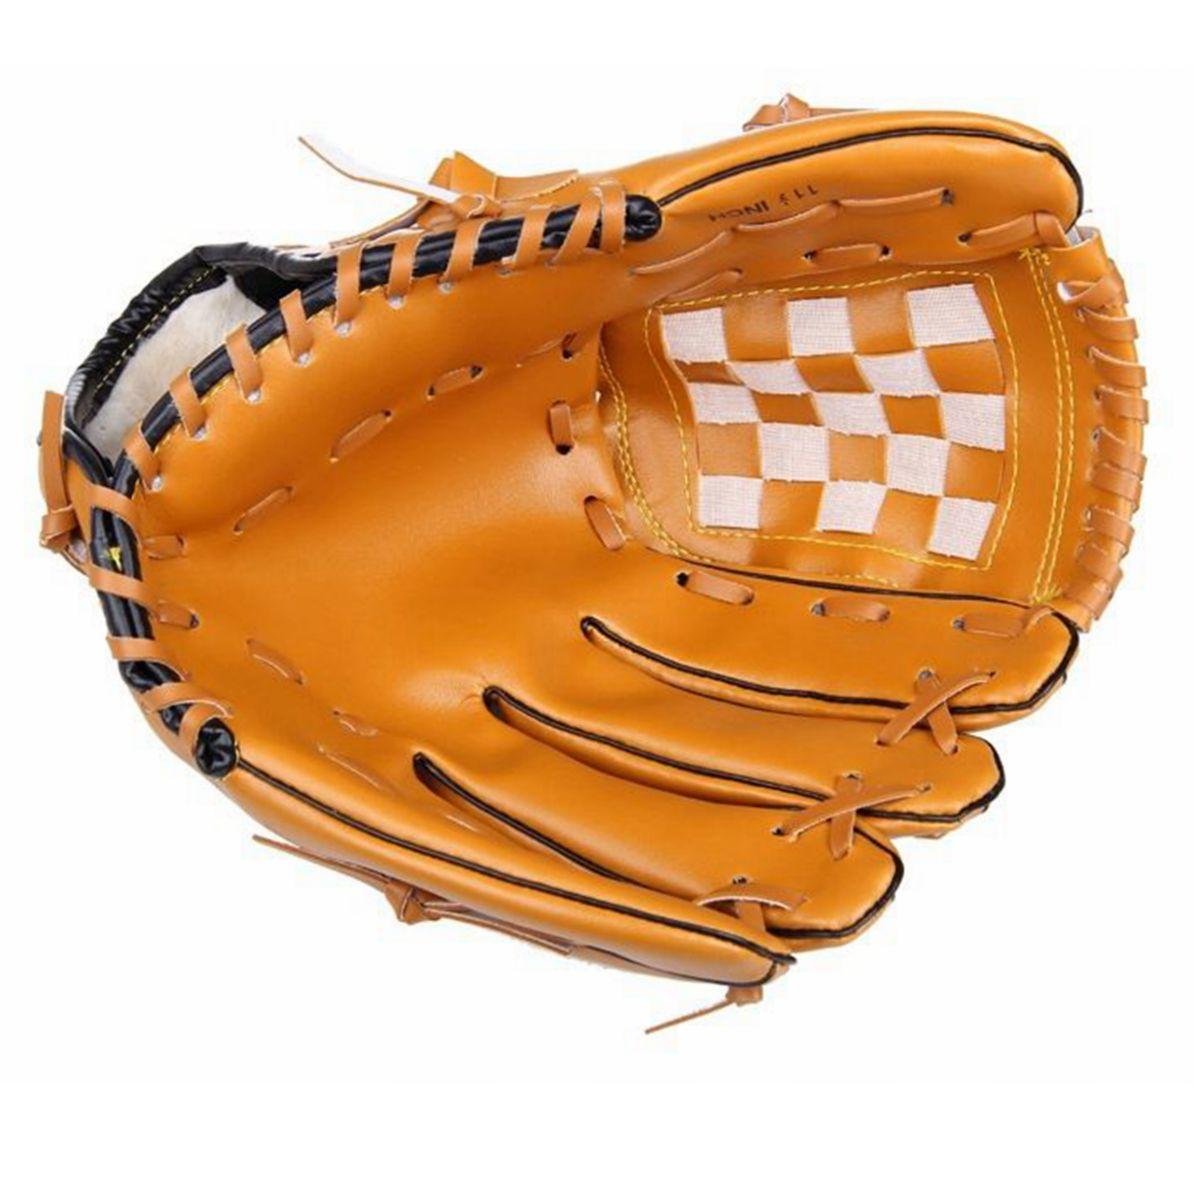 ZuverläSsig Pvc Outdoor Sport Baseball Handschuhe Erwachsene Mann Frau Tragbare Praxis Ausrüstung Ausbildung Hardball Softball Baseball Handschuh ZuverläSsige Leistung Sport Zubehör Sport & Unterhaltung